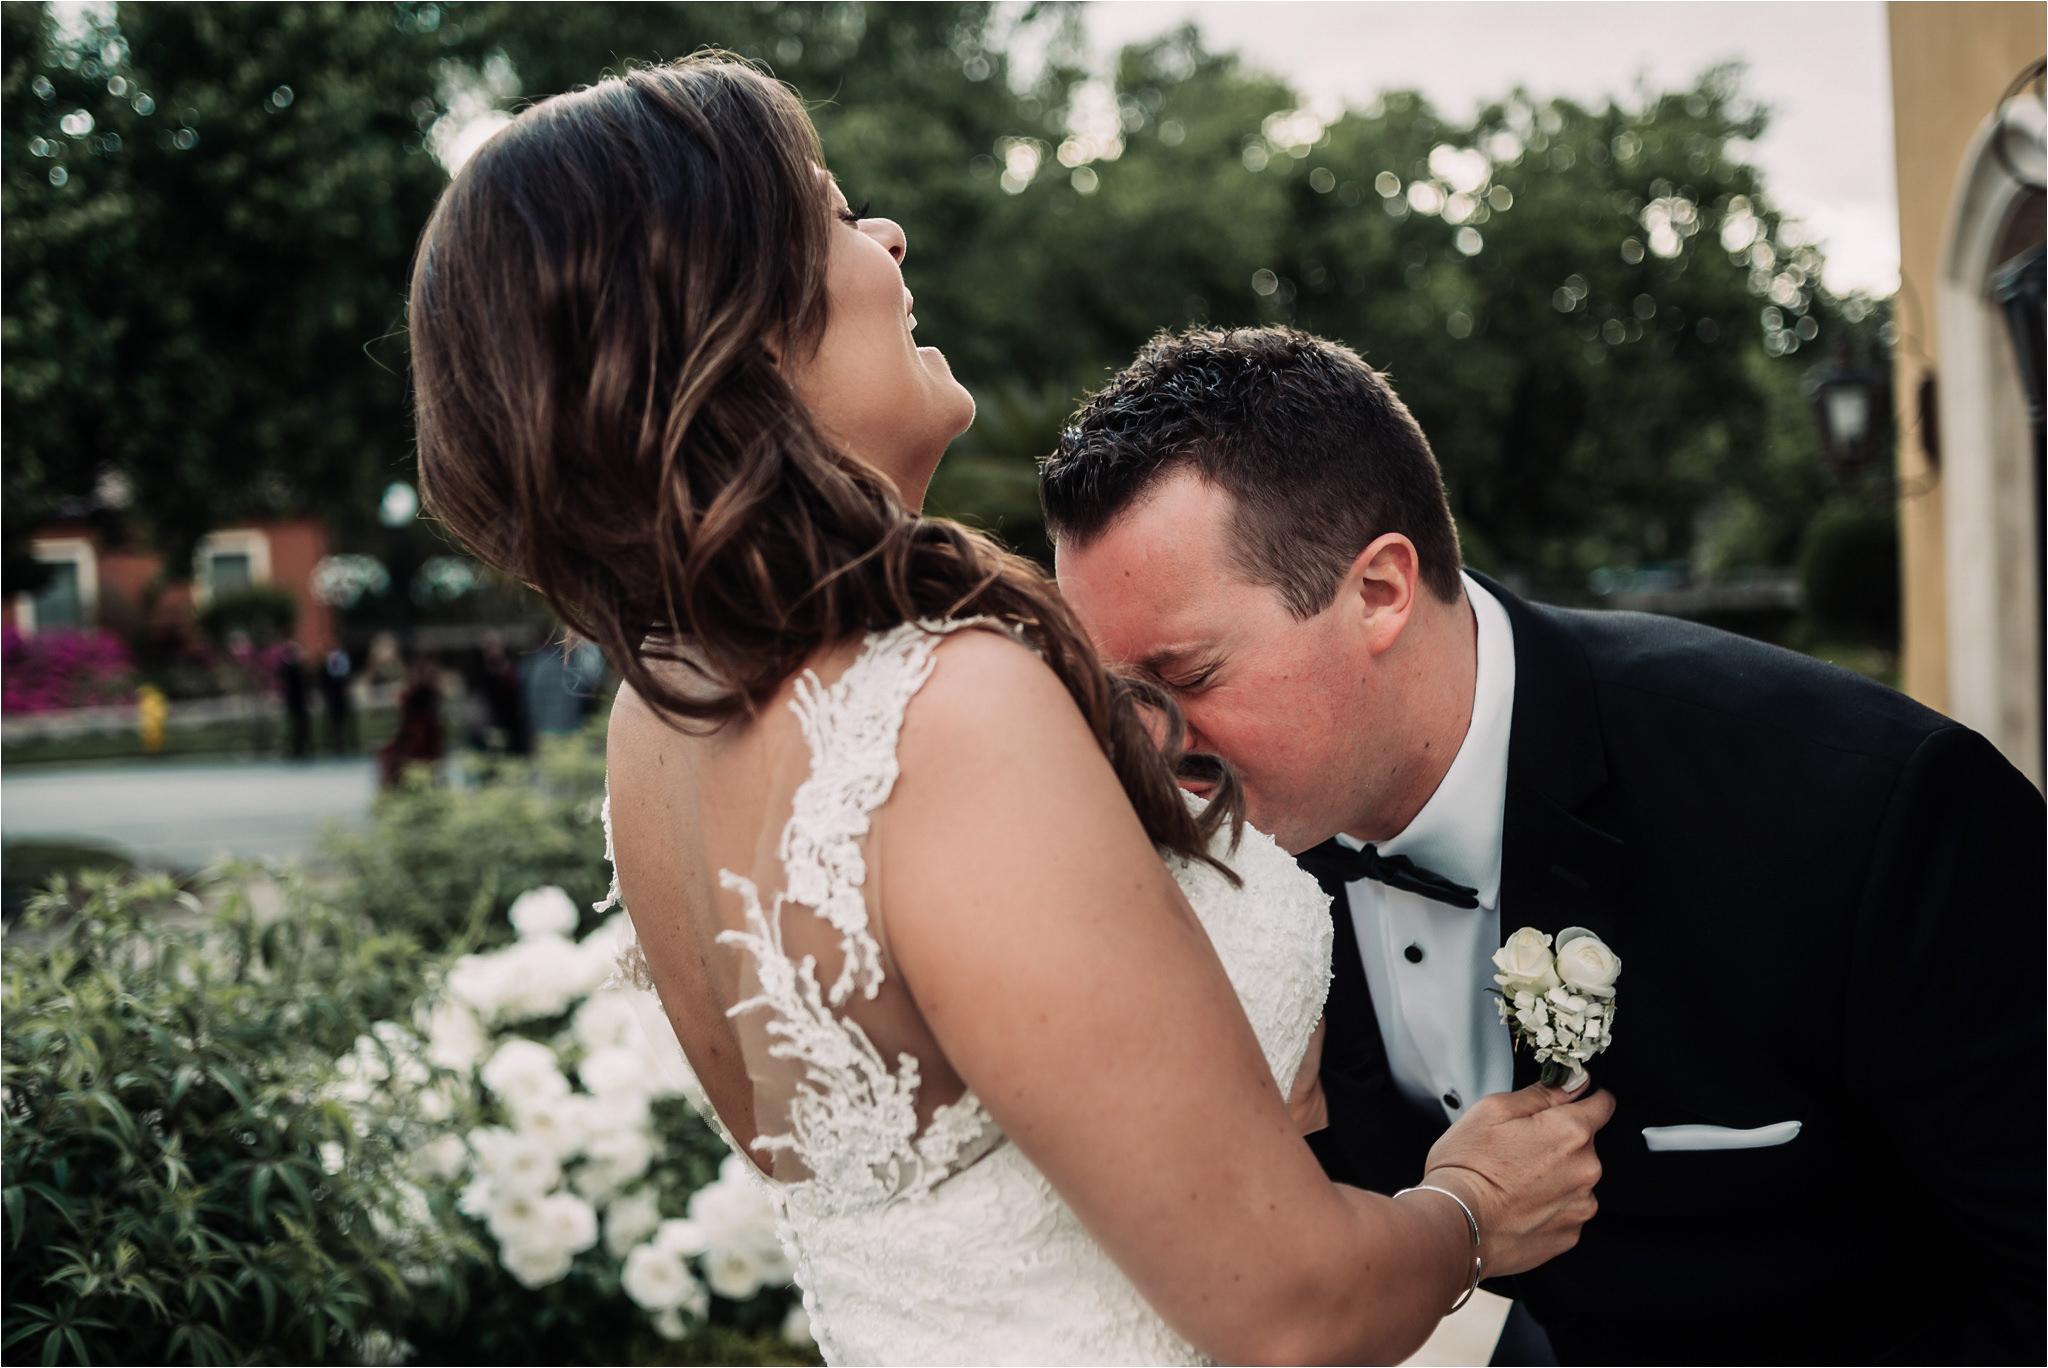 jessica-roman-photography-arden hills wedding photograpger-sacramento-boise-36.jpg